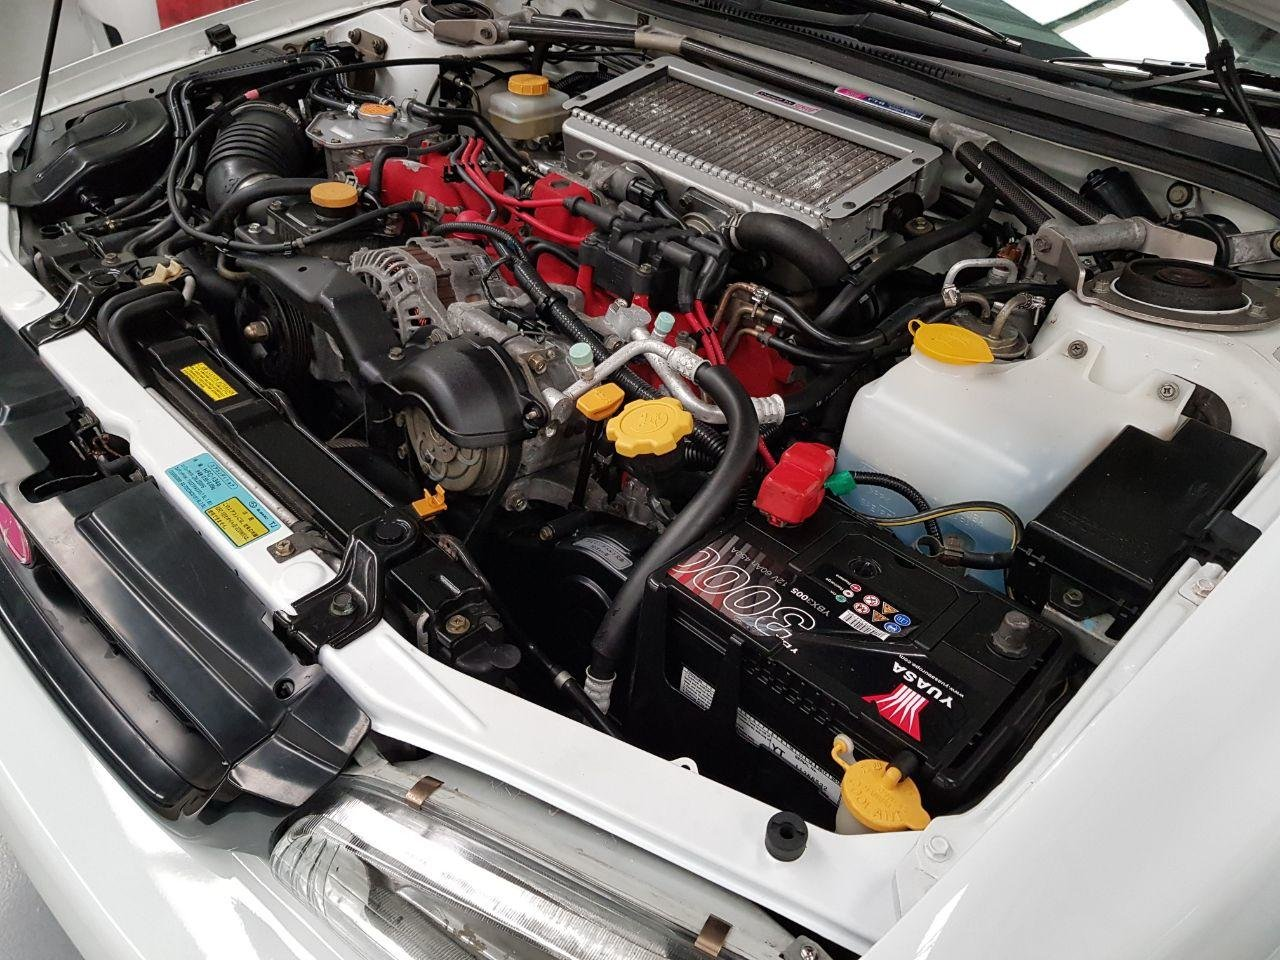 1998 Subaru Impreza 2.0 STI Type R Version 5 GC8 - 14984 MILES For Sale (picture 6 of 6)